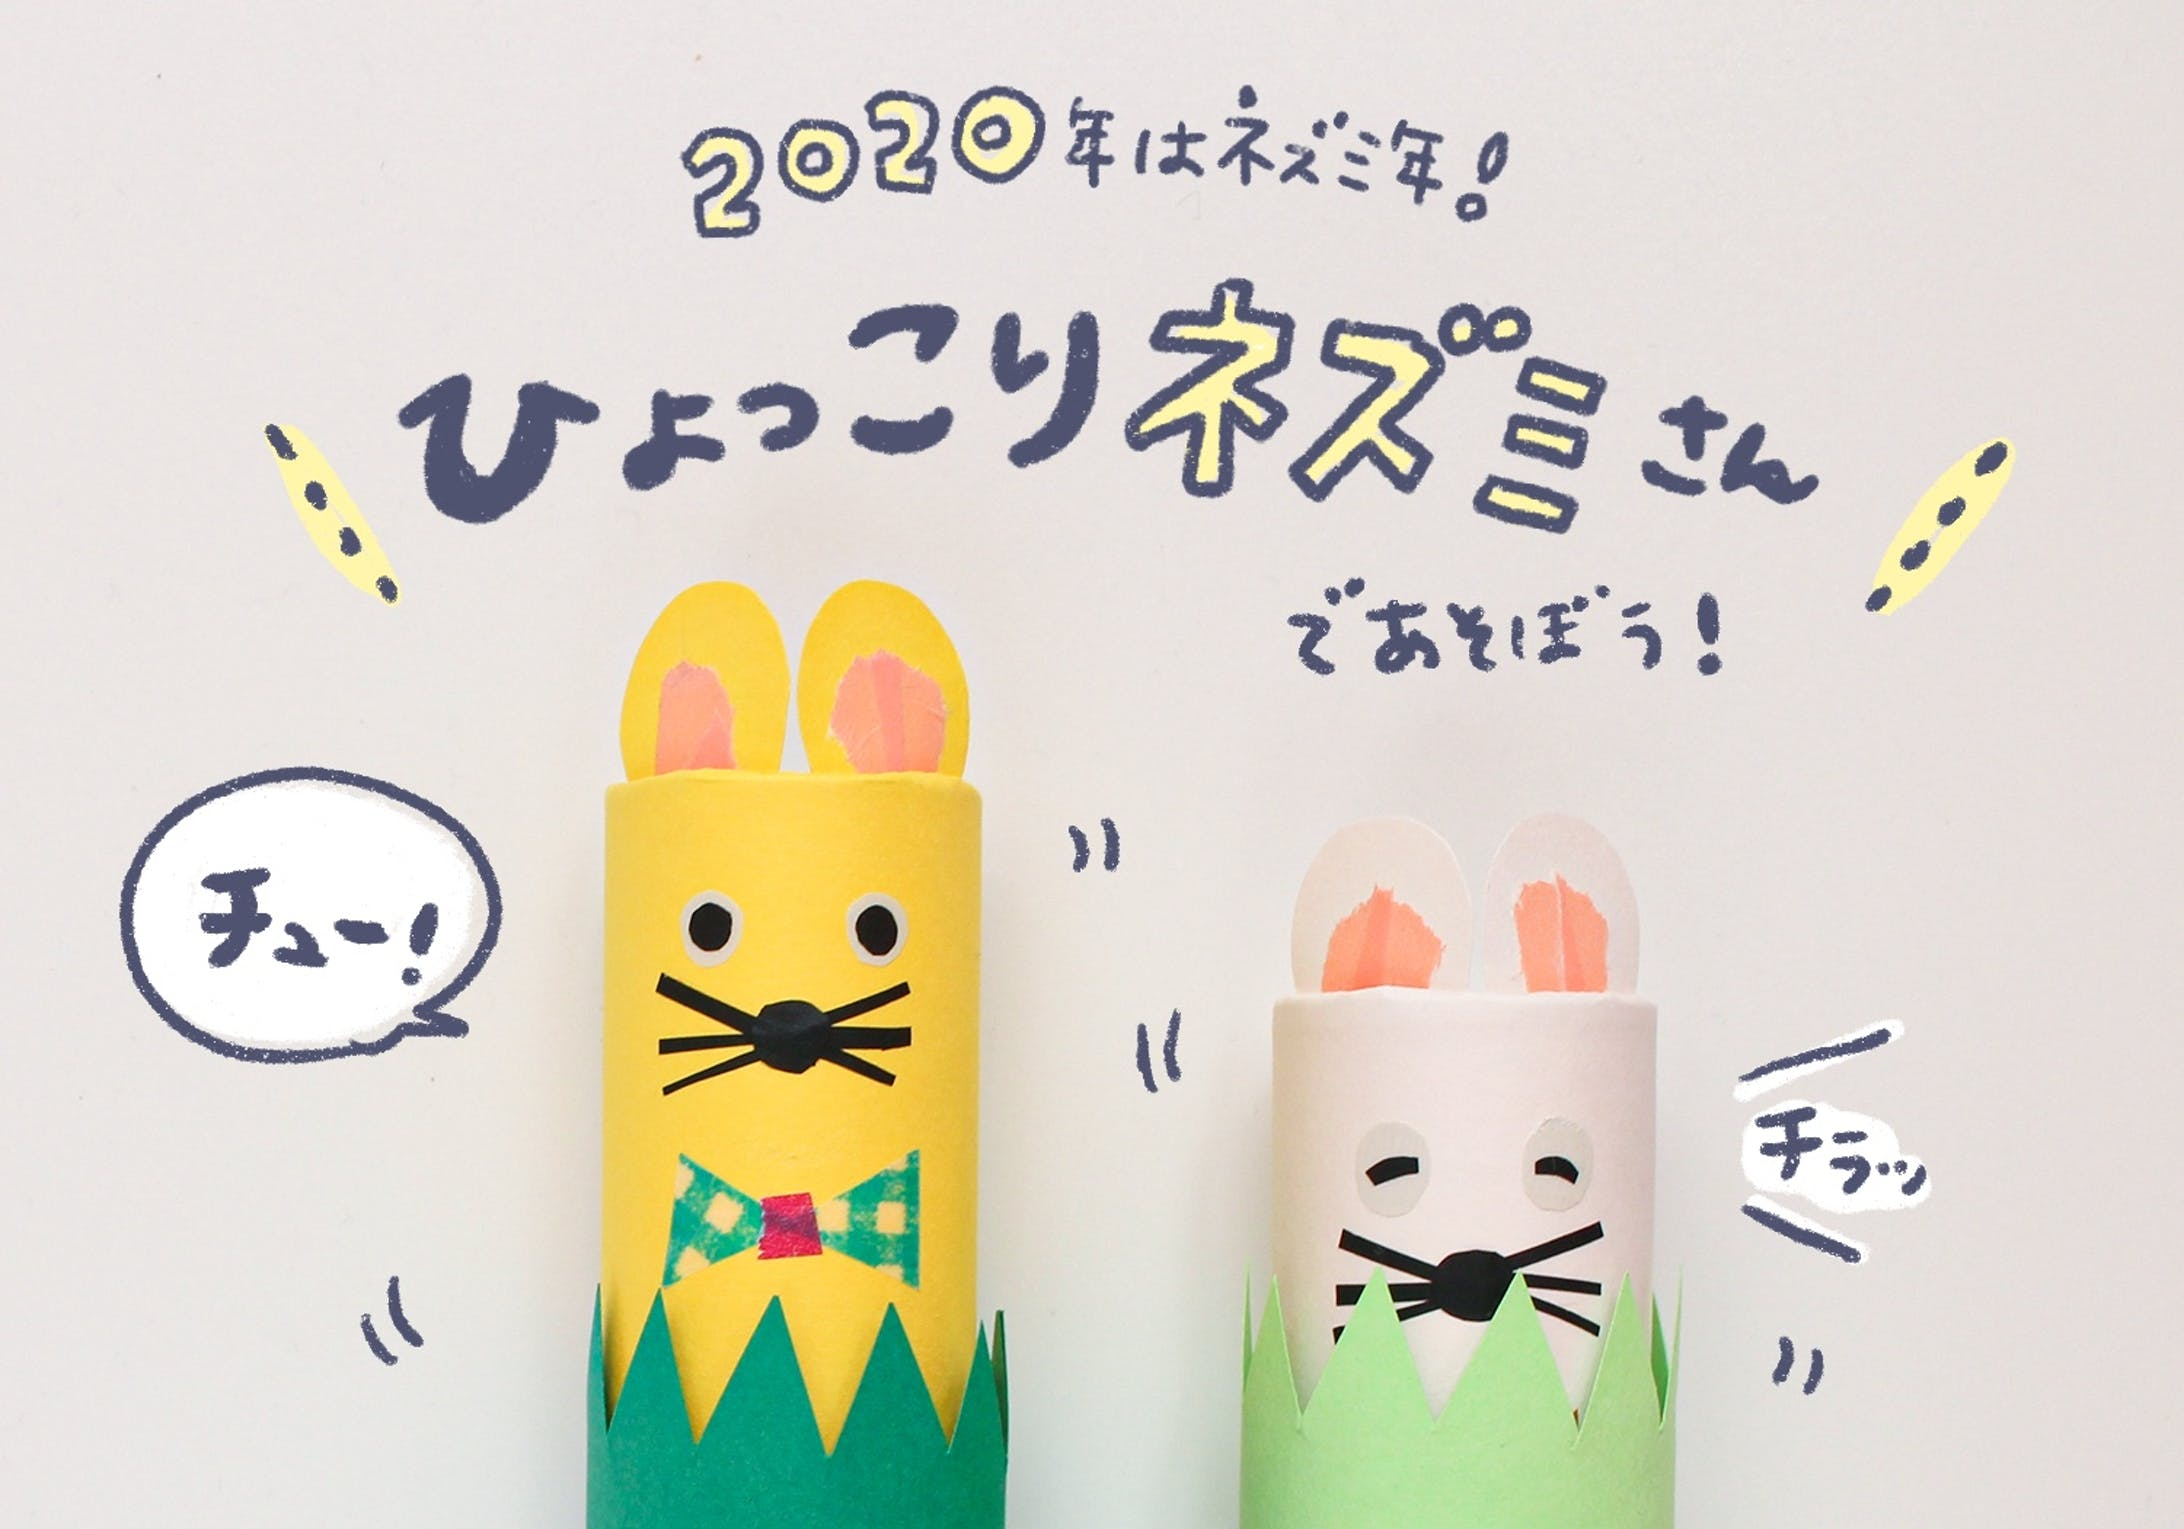 CHANTO WEB連載 2020年1月 手作りおもちゃ-1